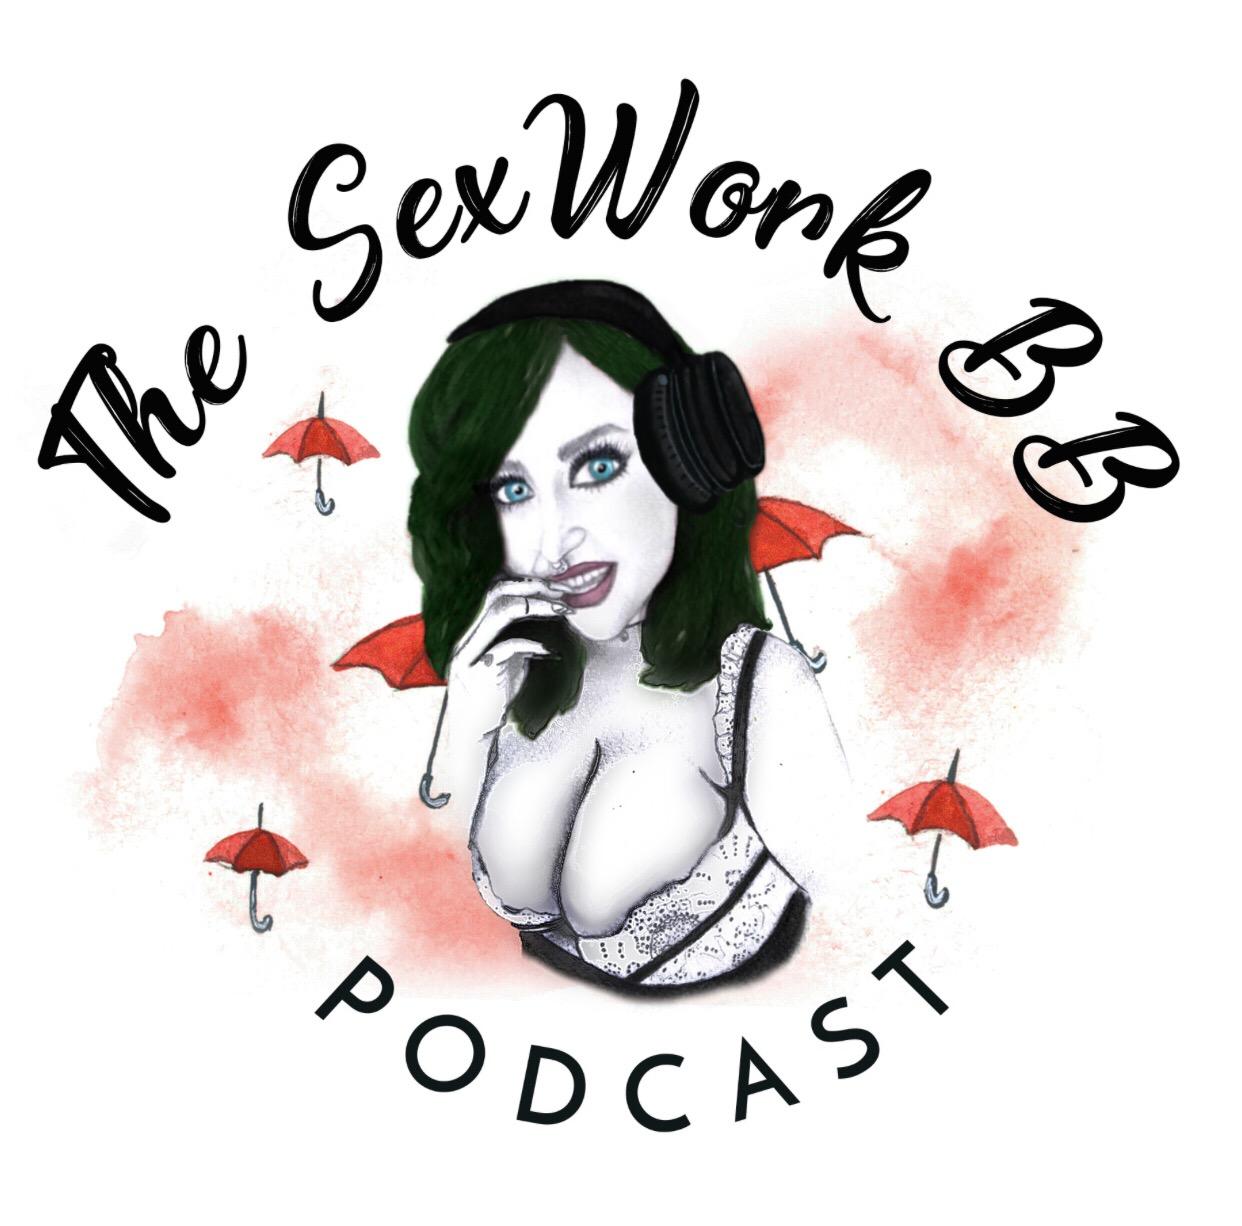 Mental Health, Patriarchy, Abortion, WTF? SWBB0051